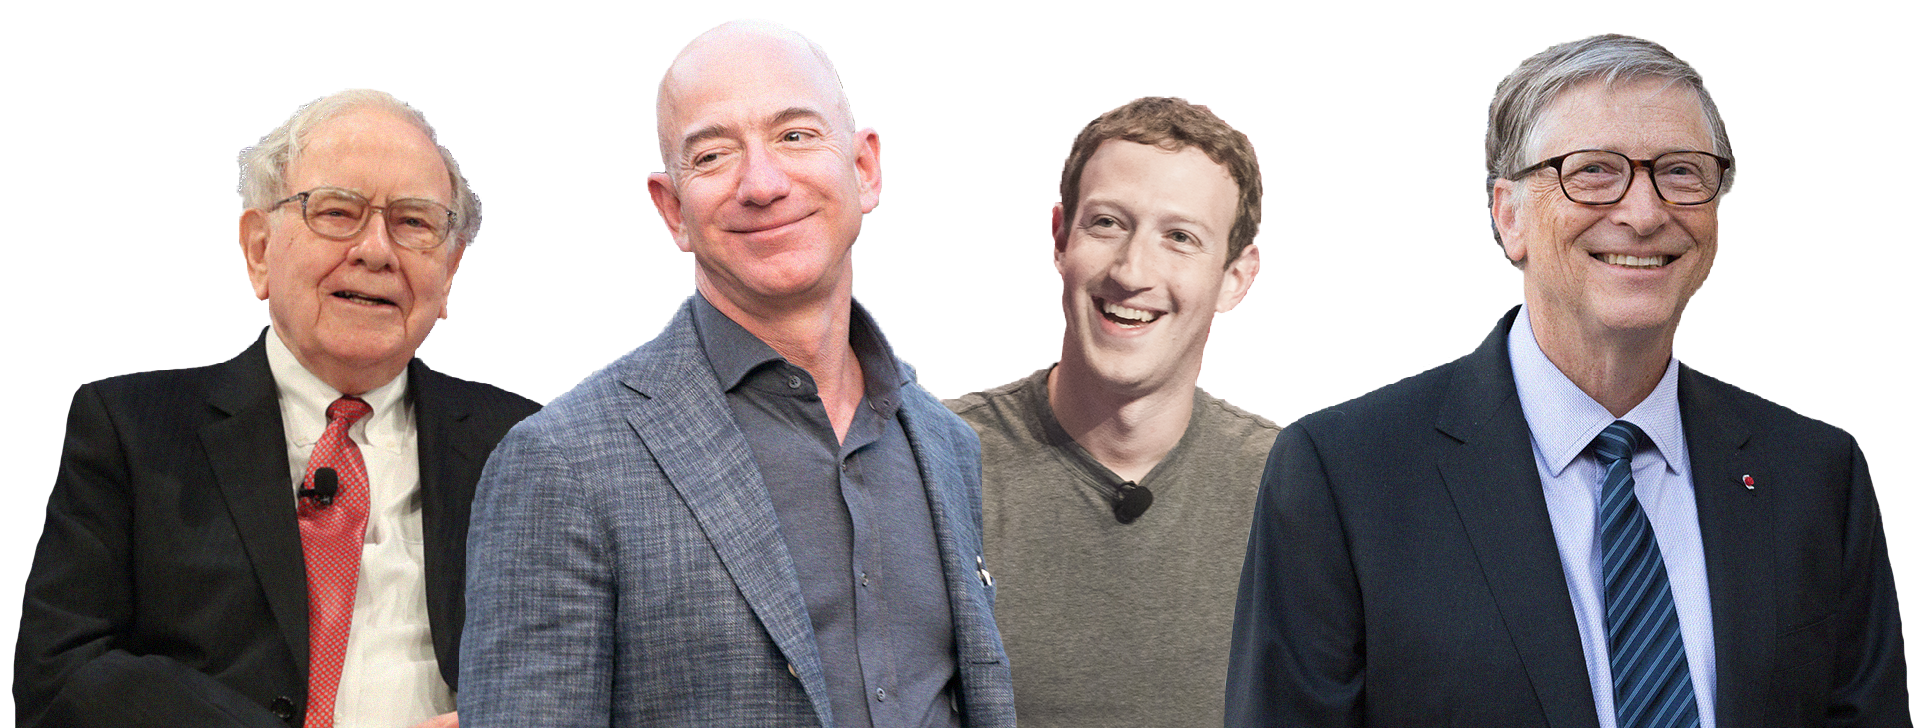 Jeff Bezos, Bill Gates, Warren Buffett e Mark Zuckerberg